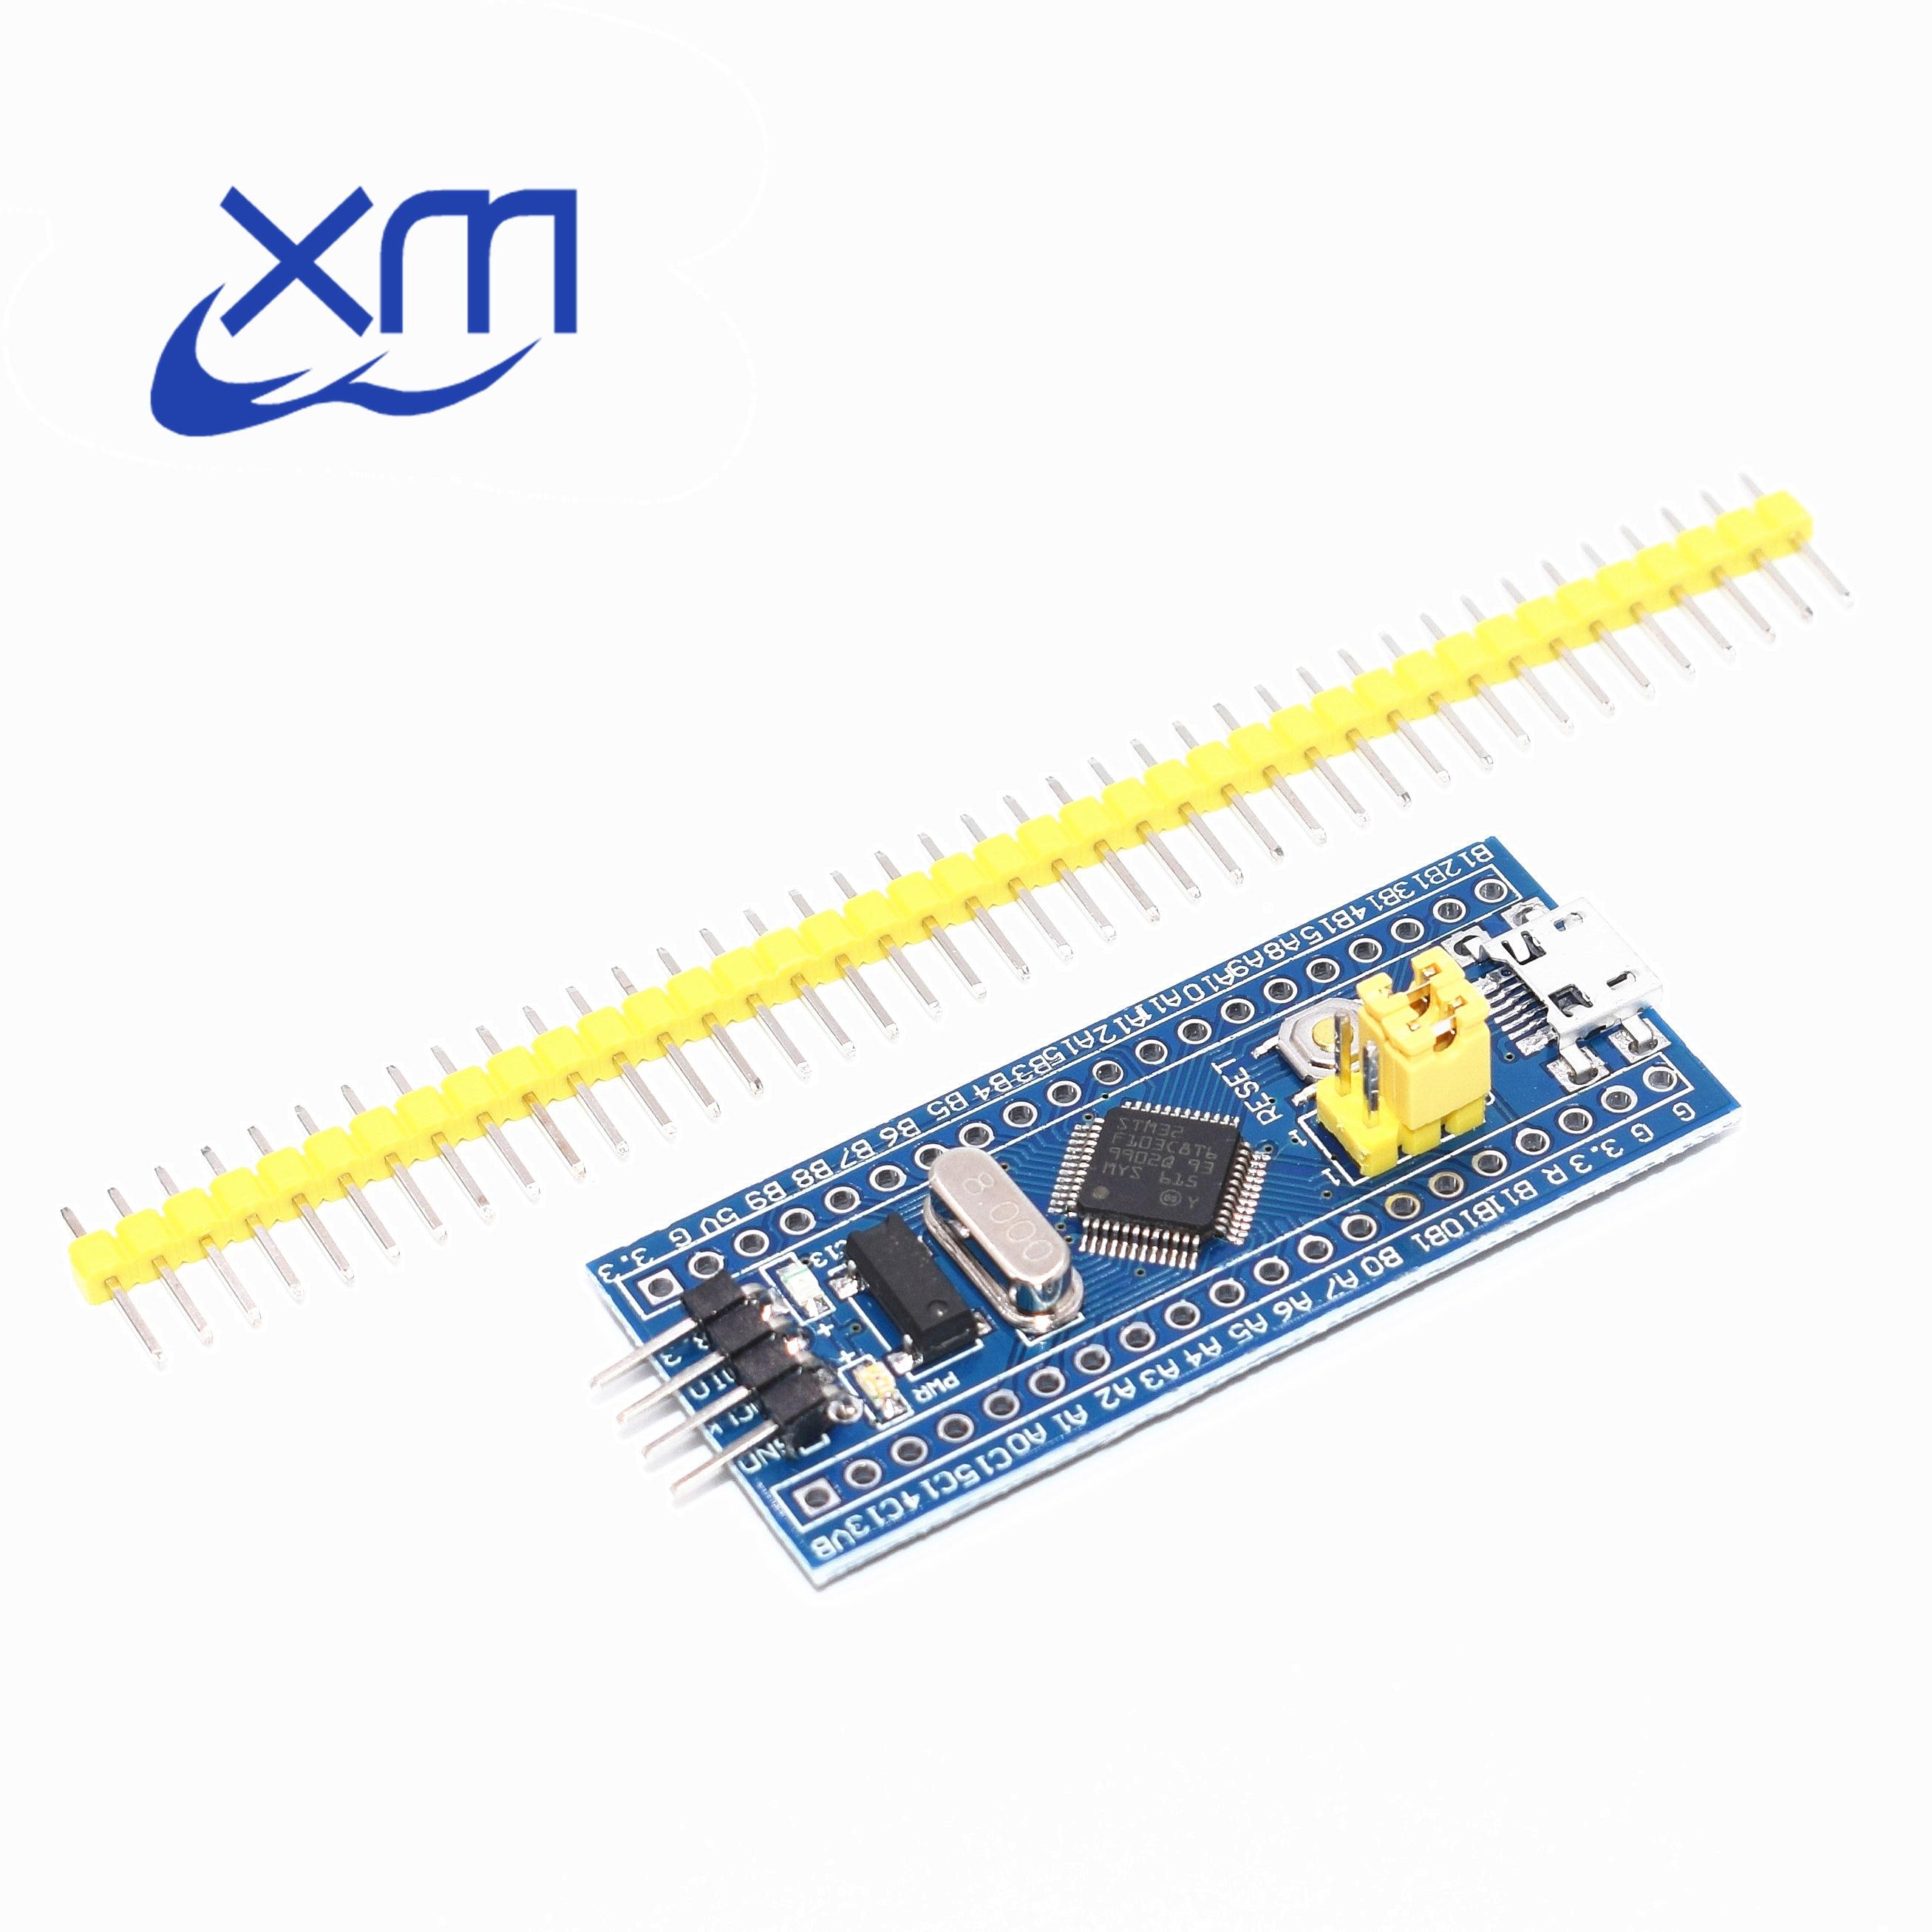 STM32F103C8T6 ARM STM32 минимальная системная плата модуля для Arduino